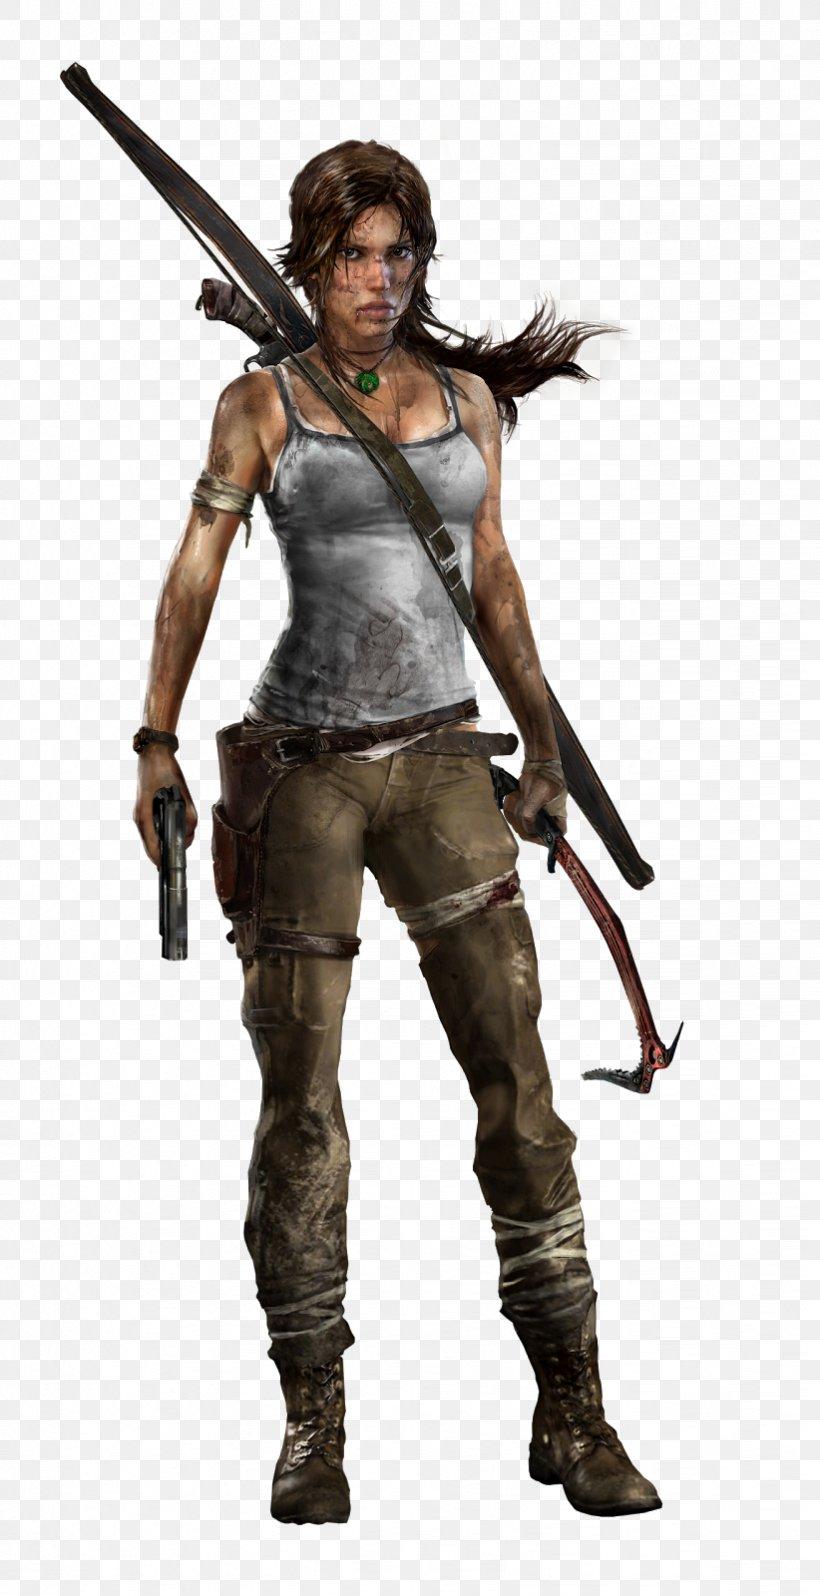 Rise Of The Tomb Raider Tomb Raider Underworld Lara Croft